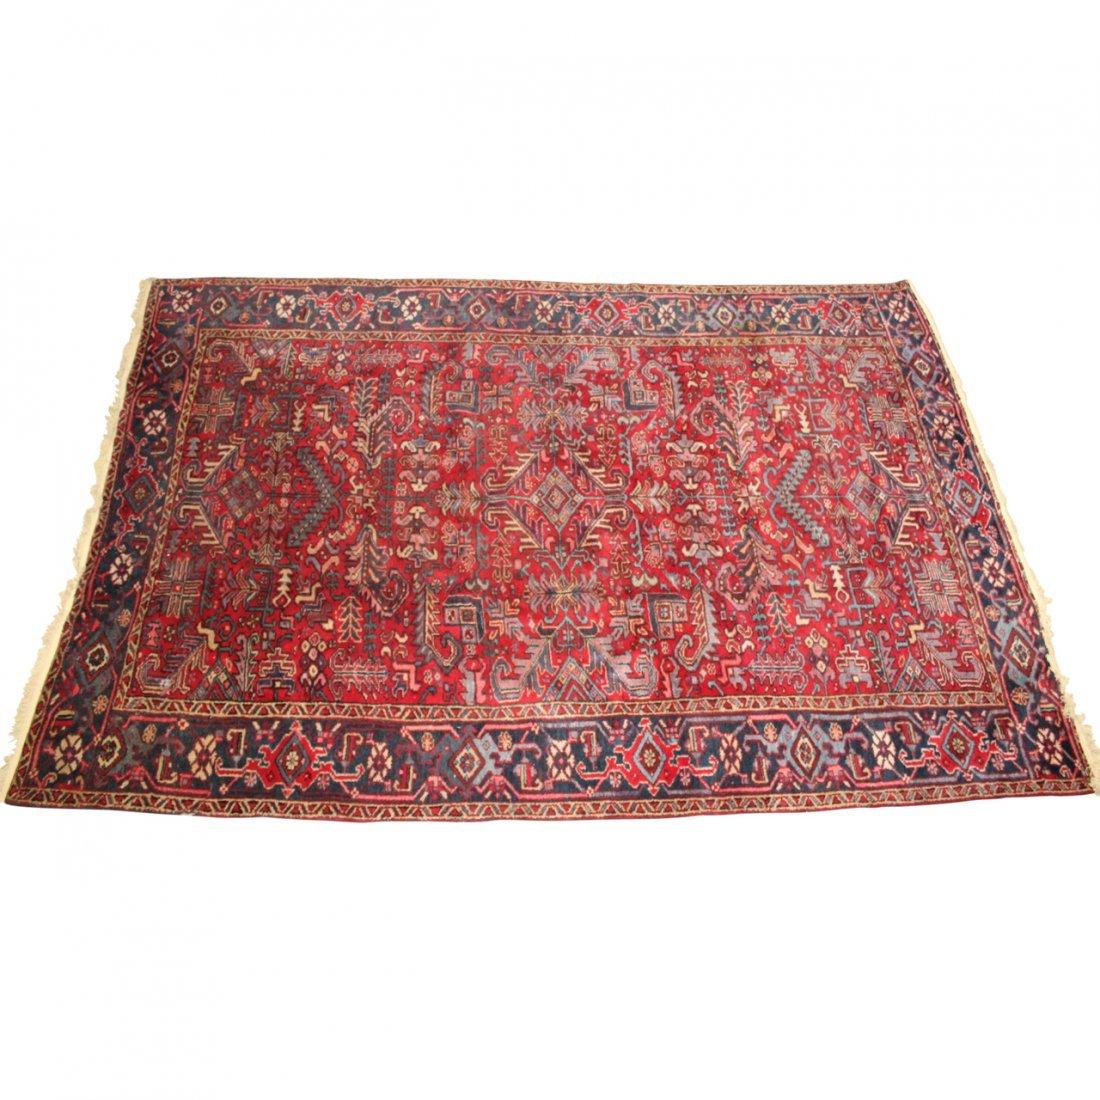 Antique Persian Large Heriz